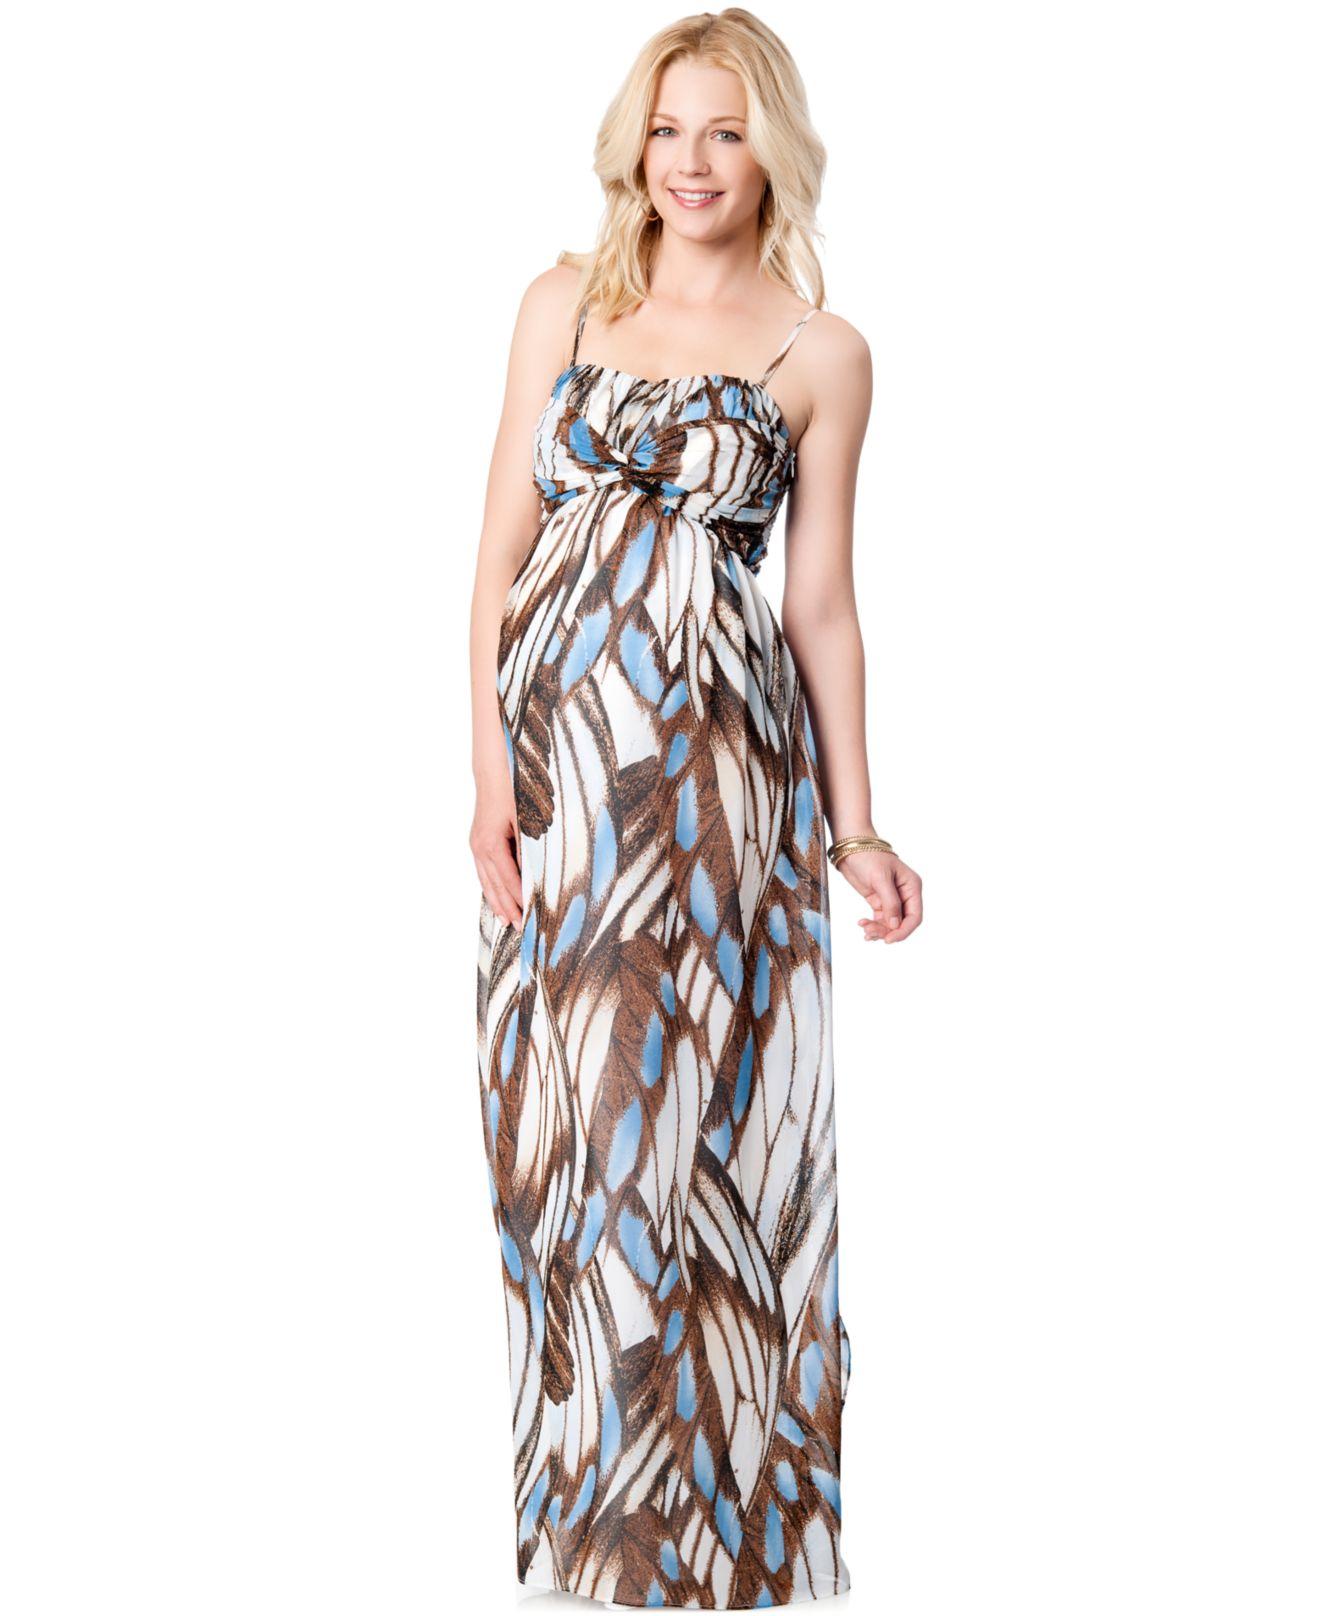 994f777951b9 Jessica Simpson Maternity Dress Pants - Photo Dress Wallpaper HD AOrg